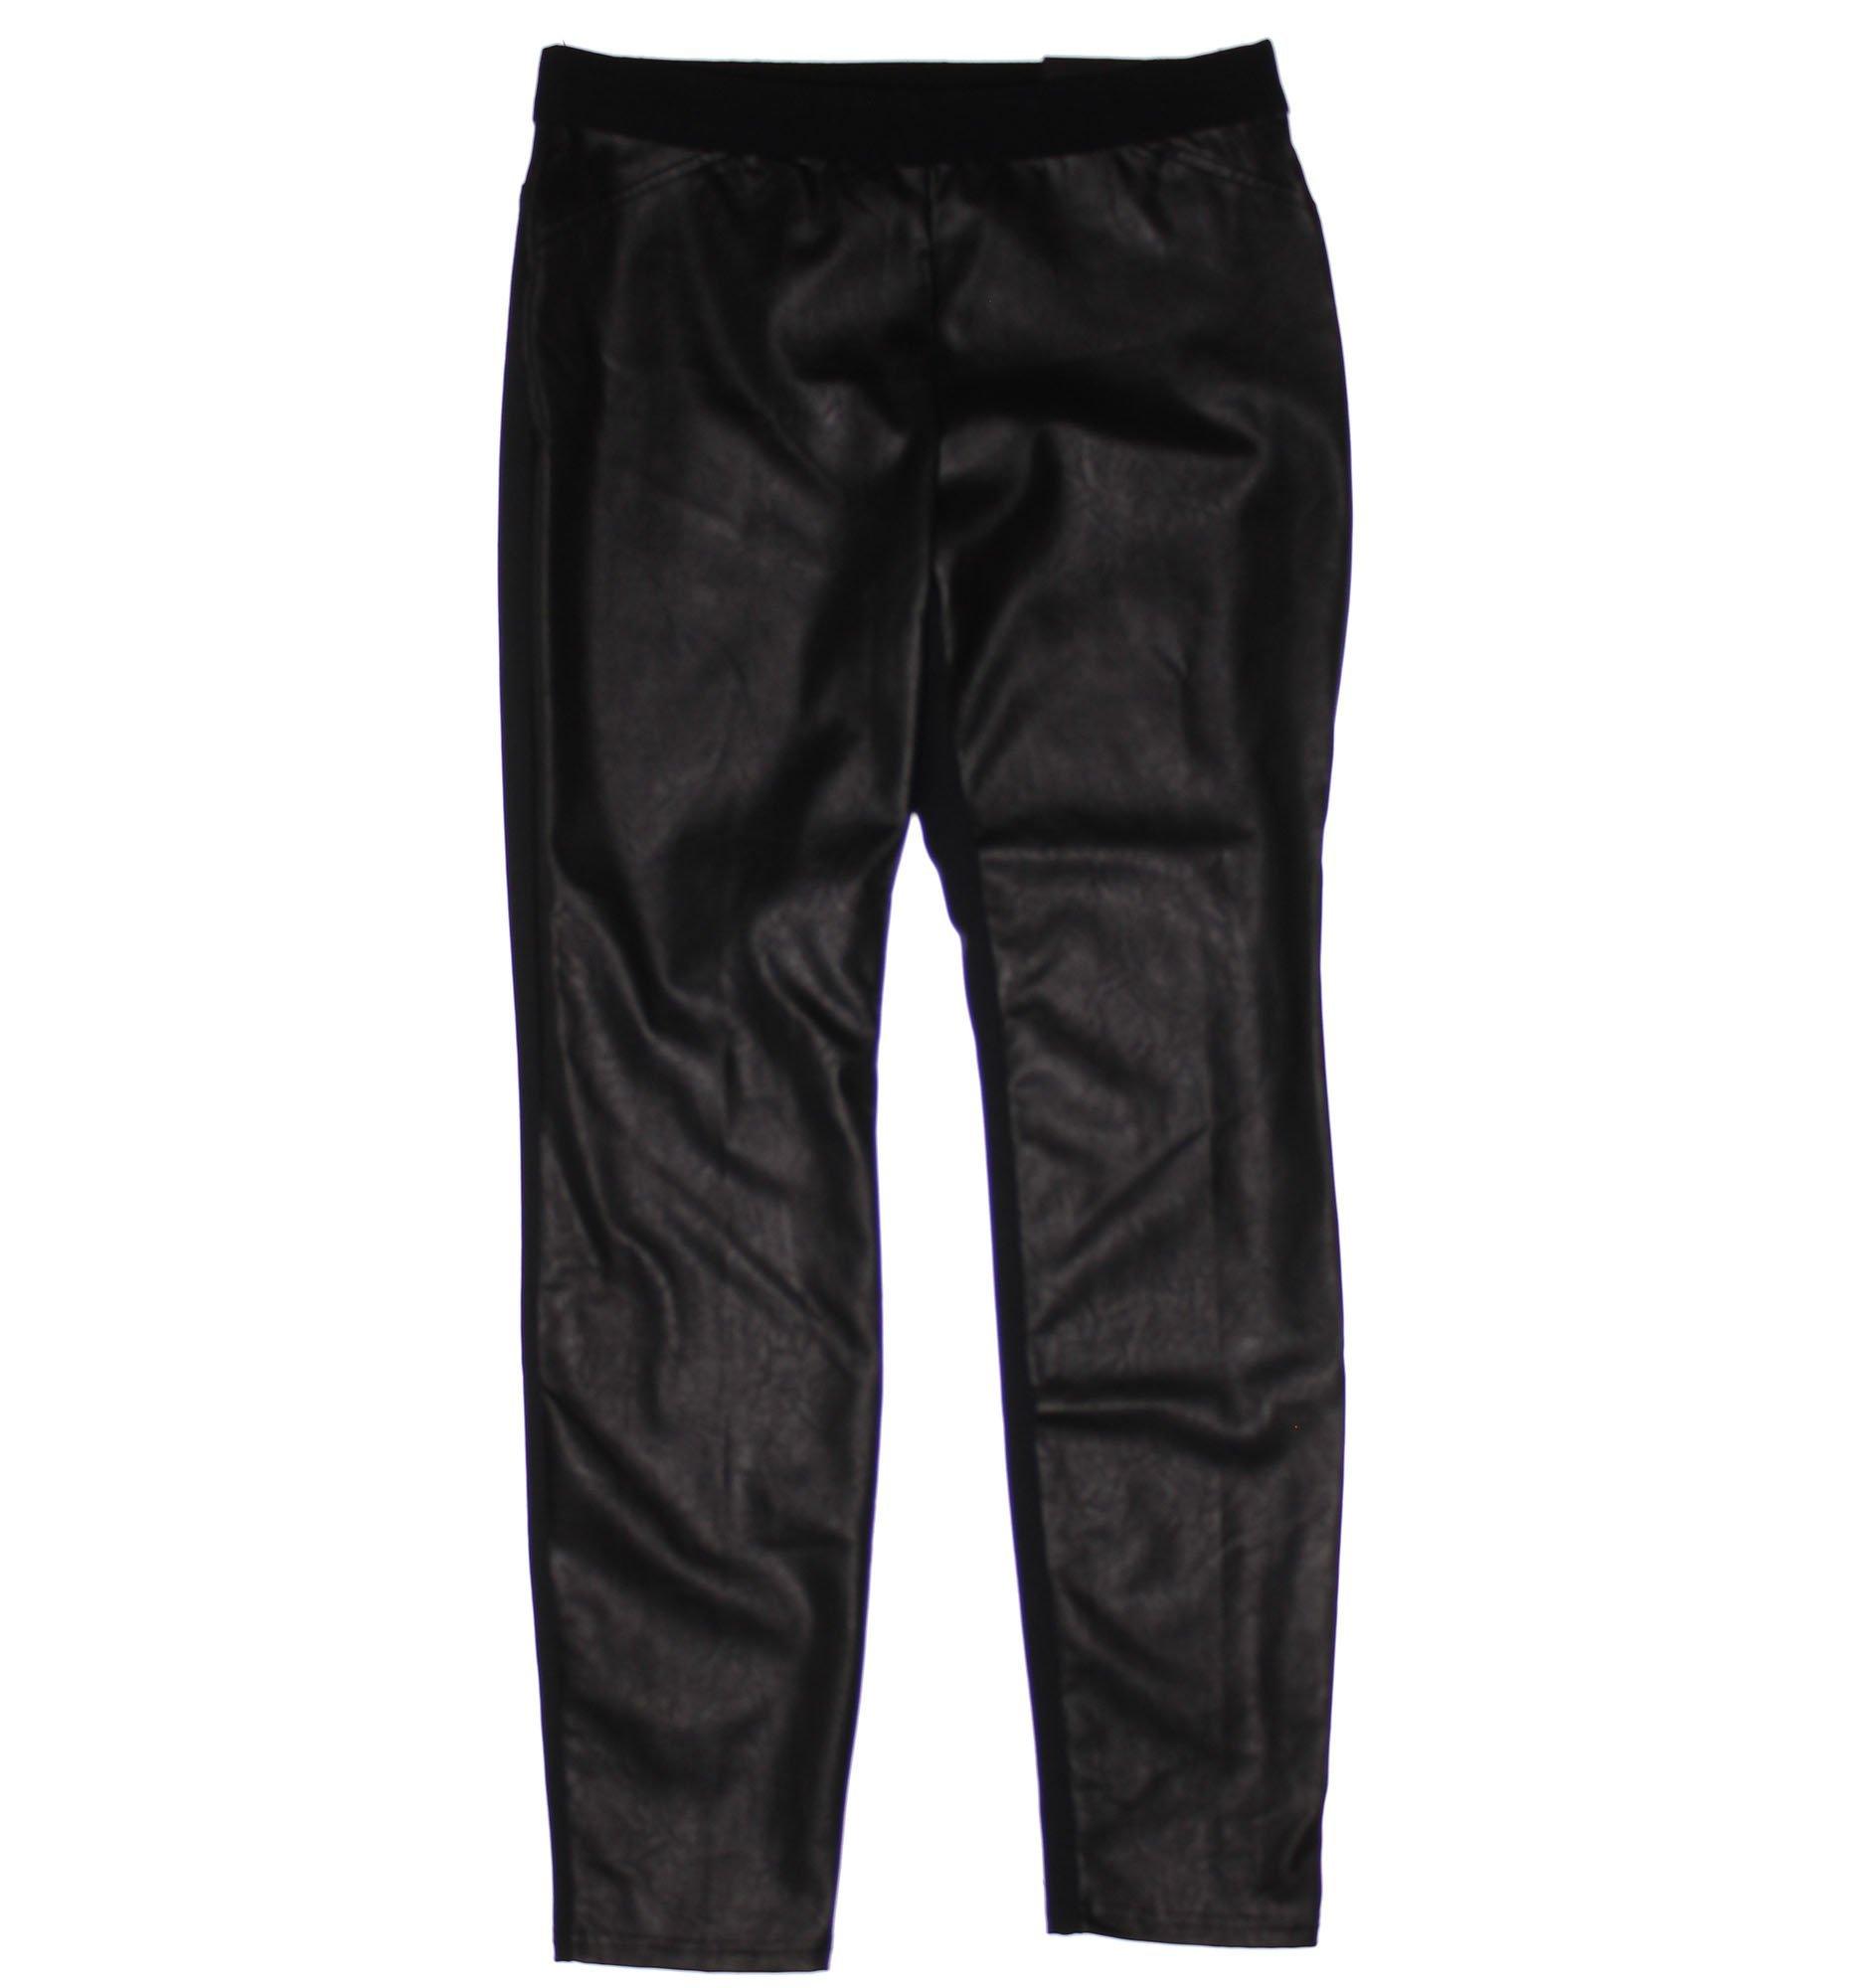 Alfani Womens Faux Leather Flat Front Casual Pants Black S